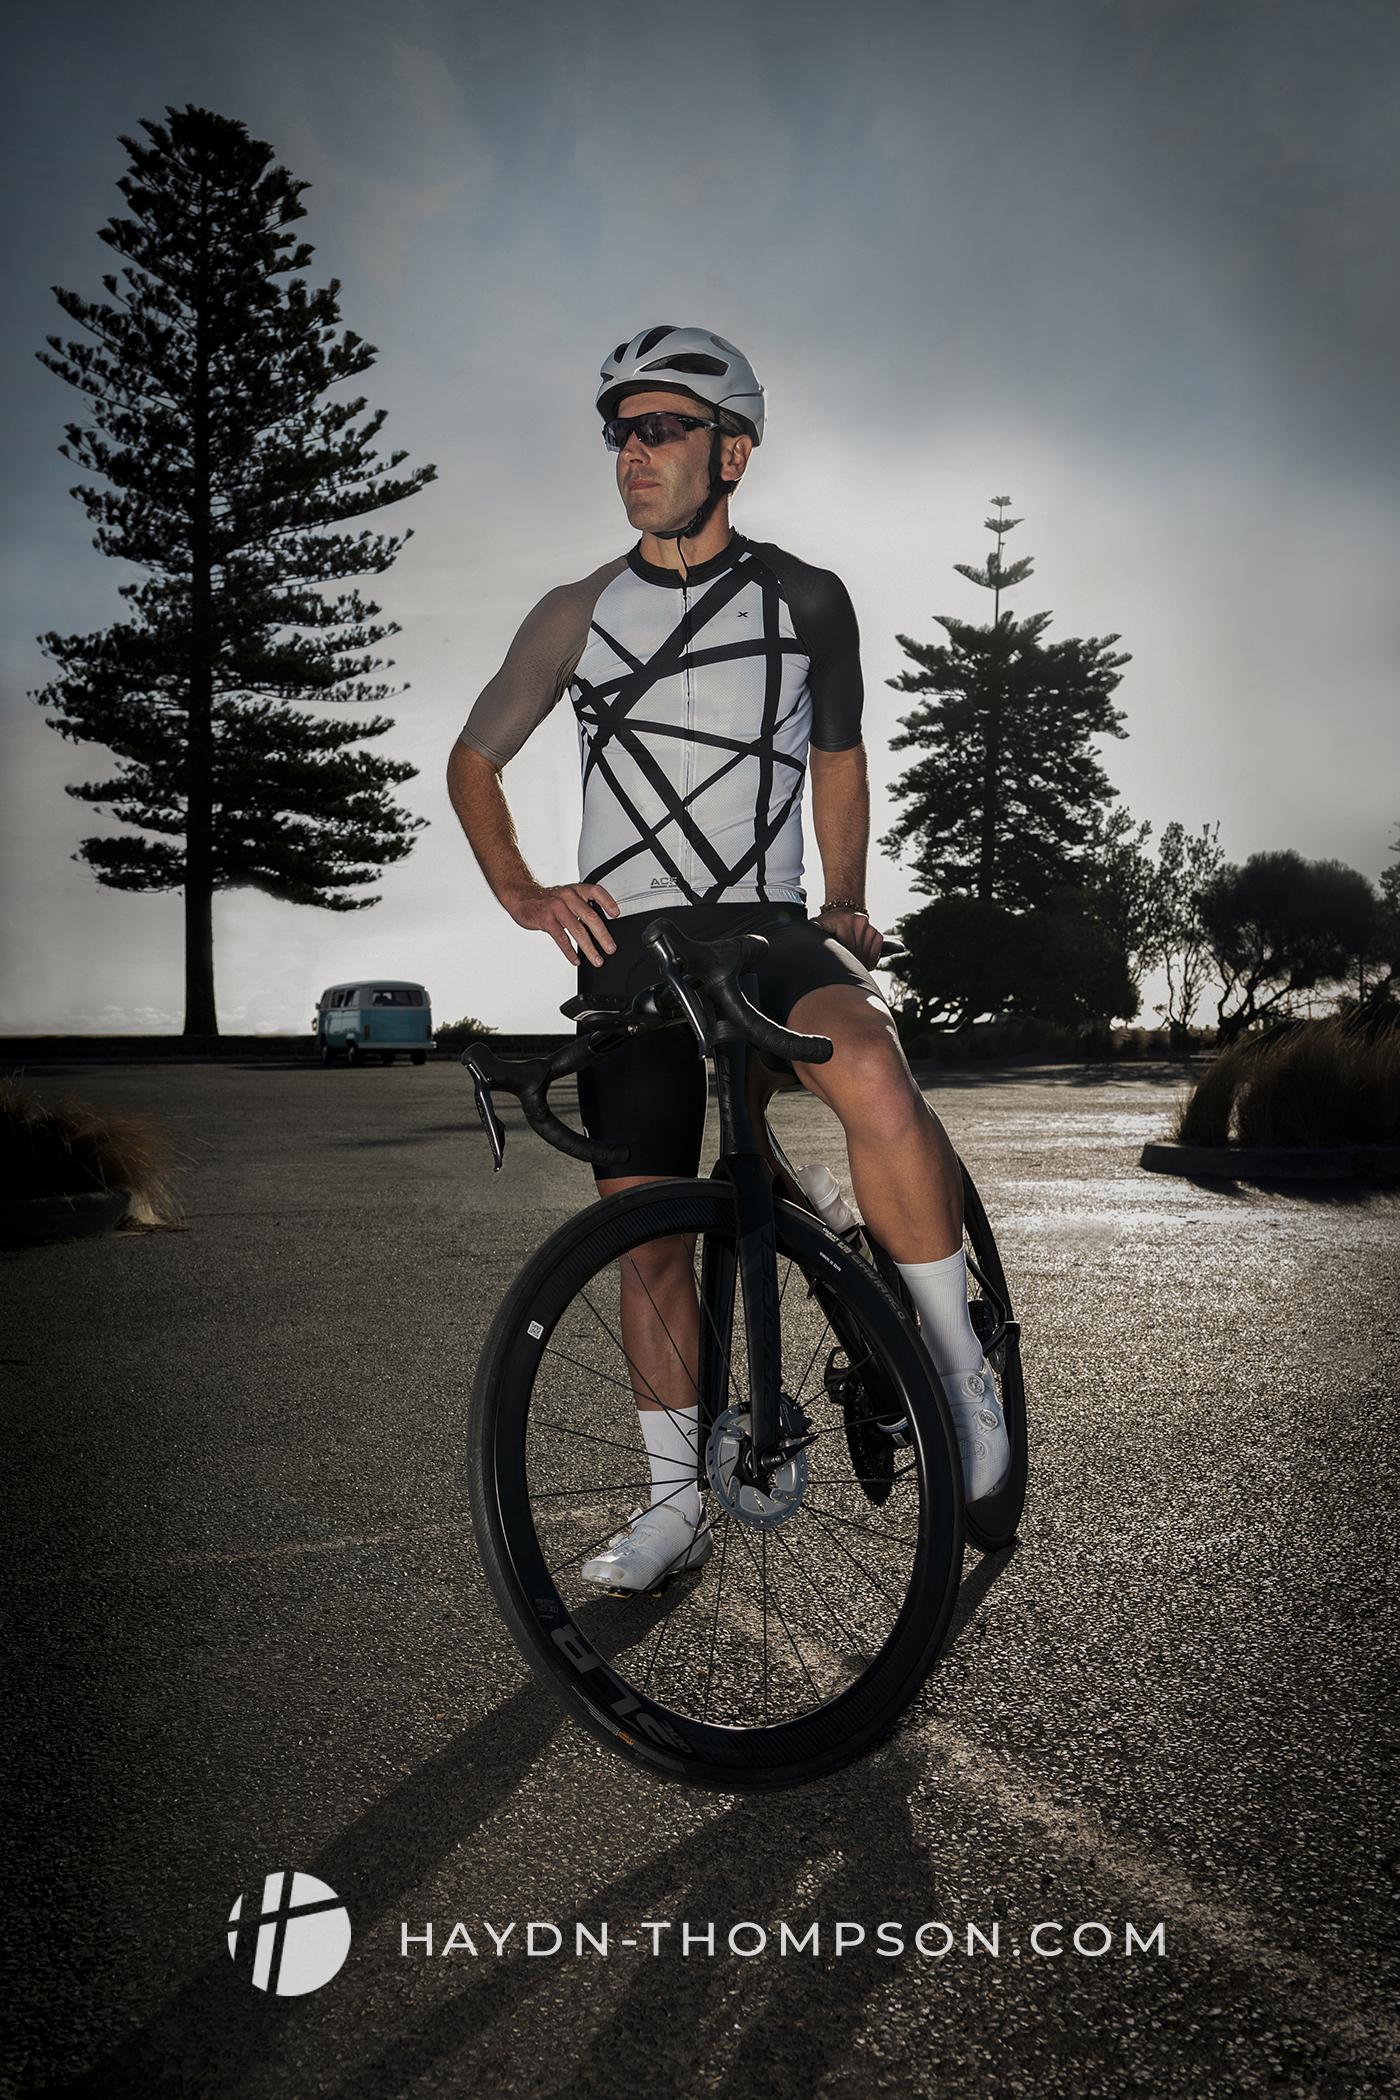 Nick - Bike Portrait 02 (Small Size - Watermark).jpg